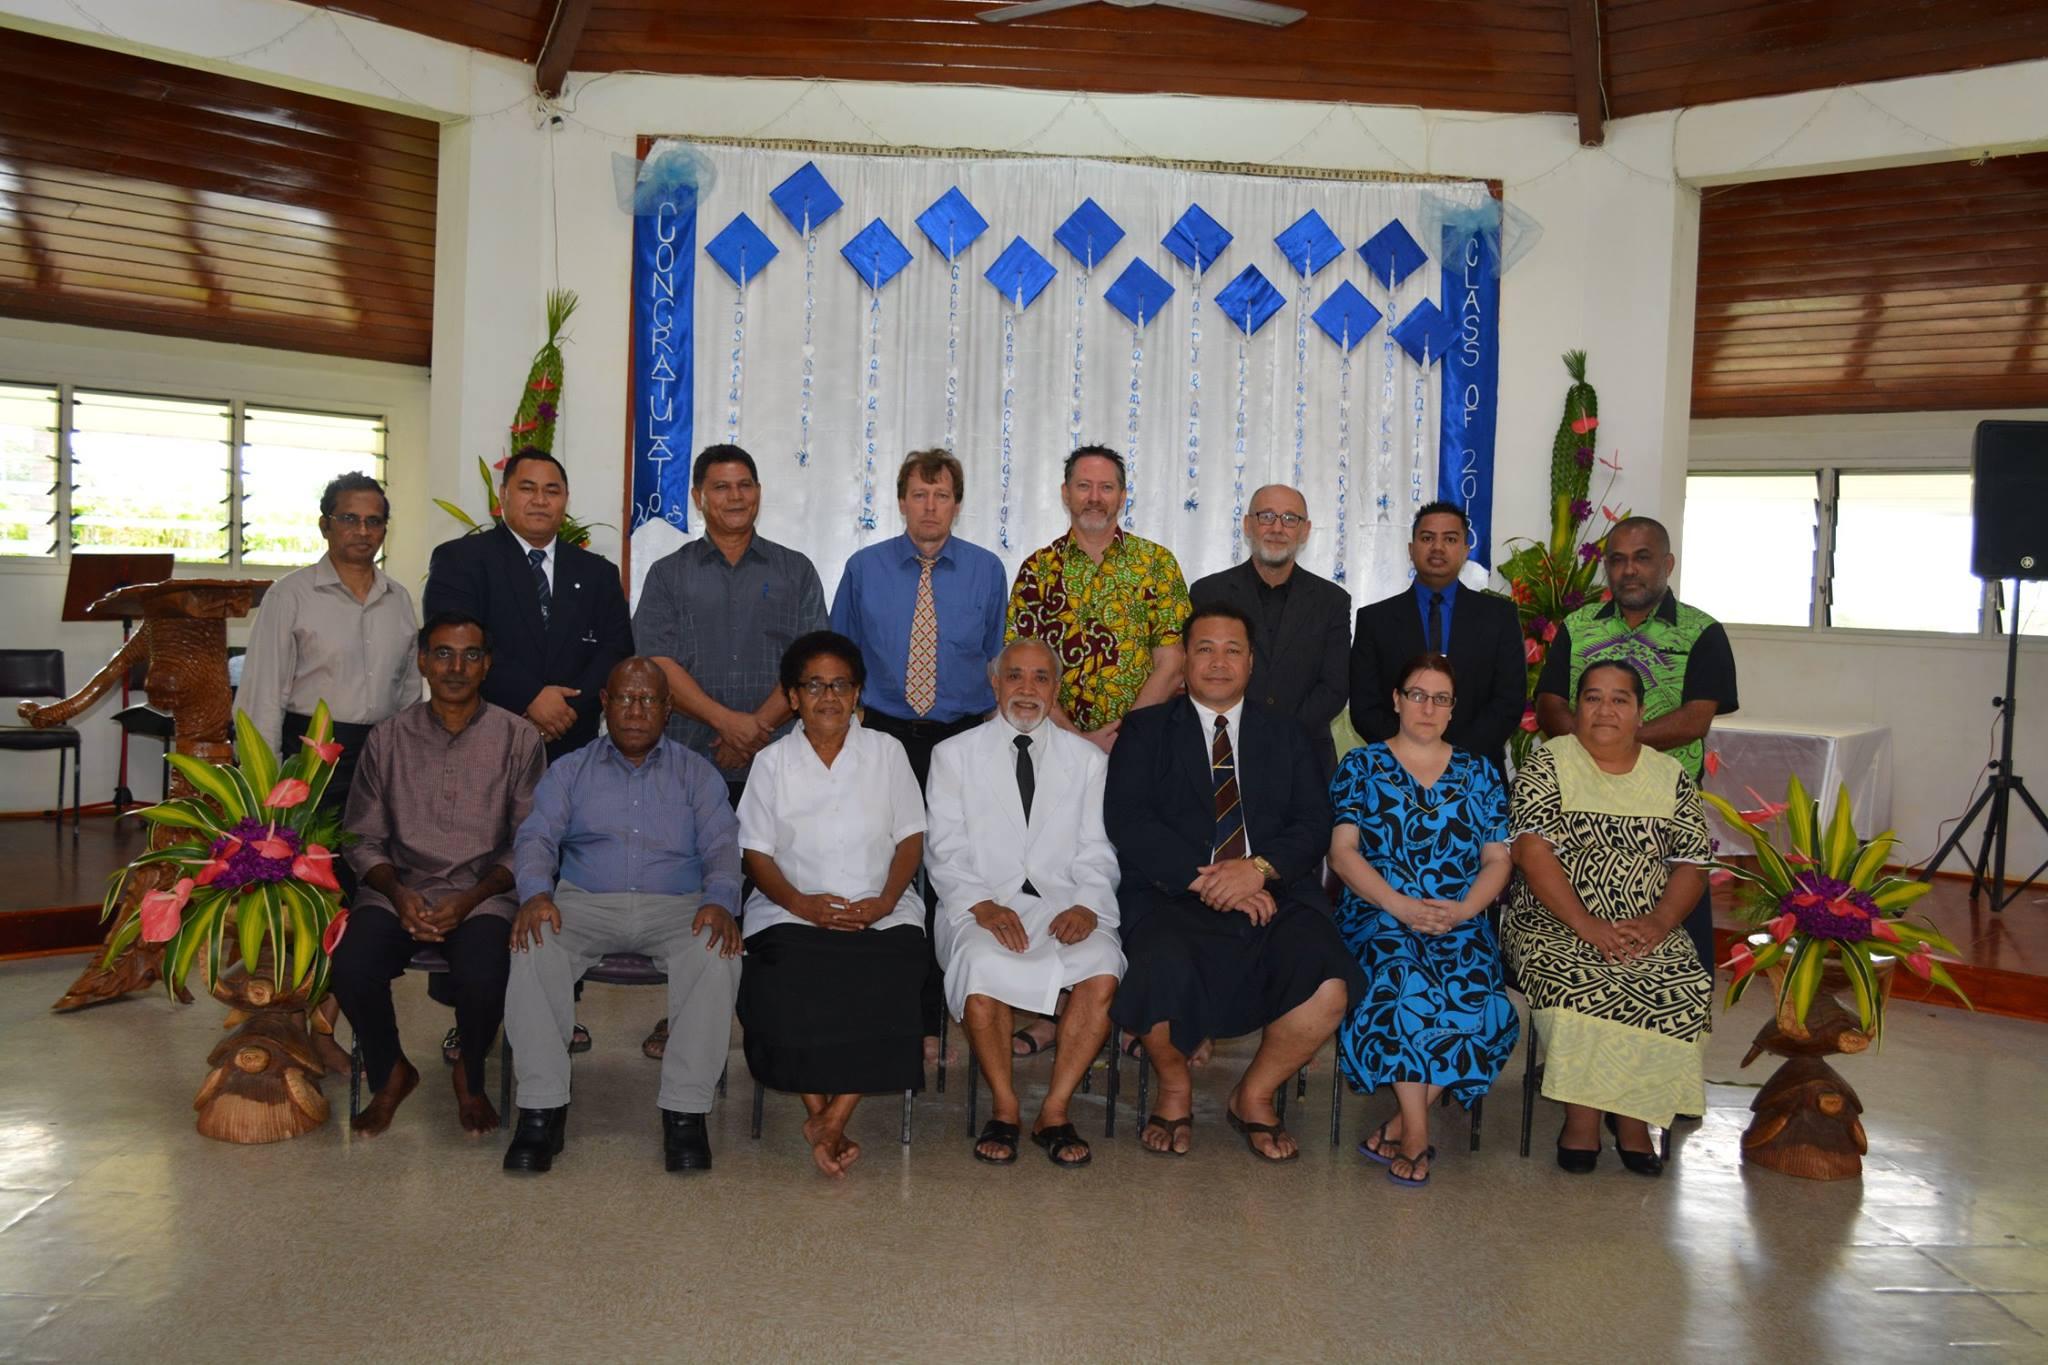 PTC Faculty Members 2018